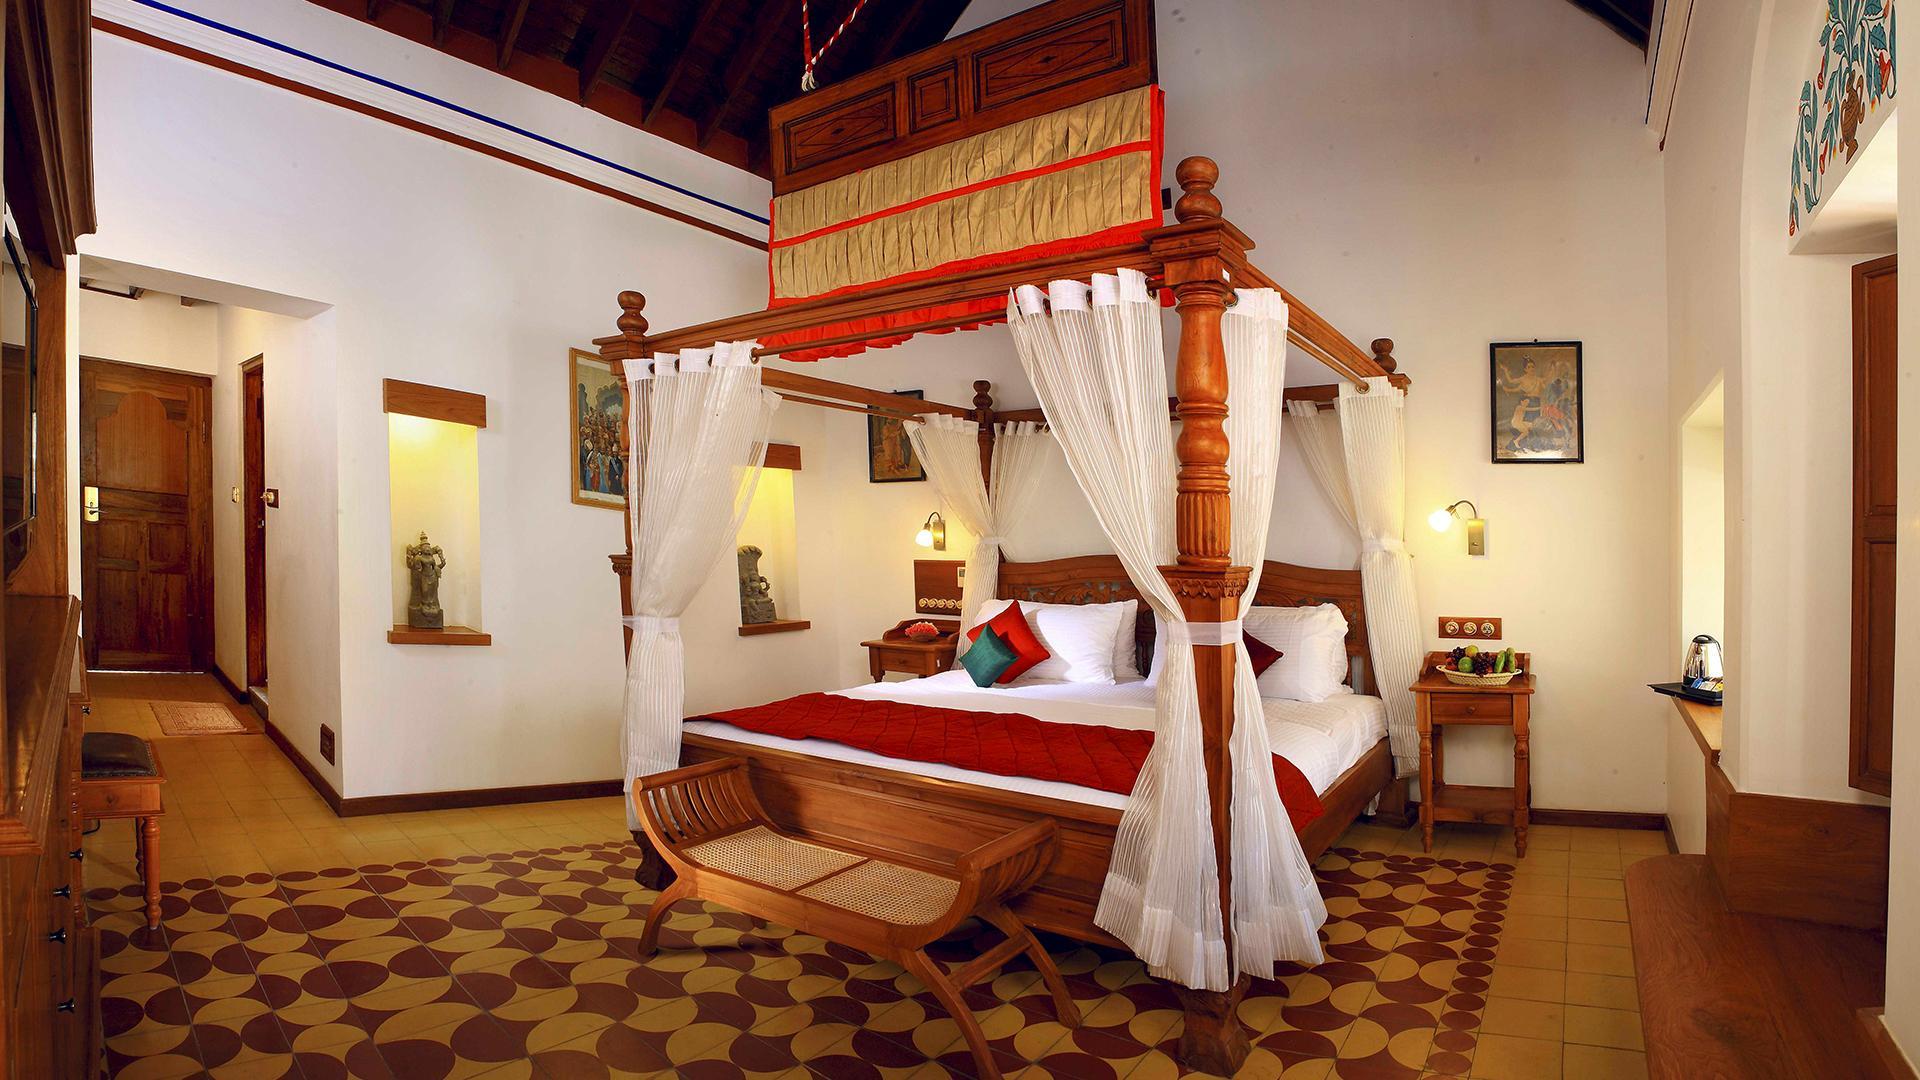 Heritage Double Room image 1 at Chidambara Vilas by Pudukkottai, Tamil Nadu, India